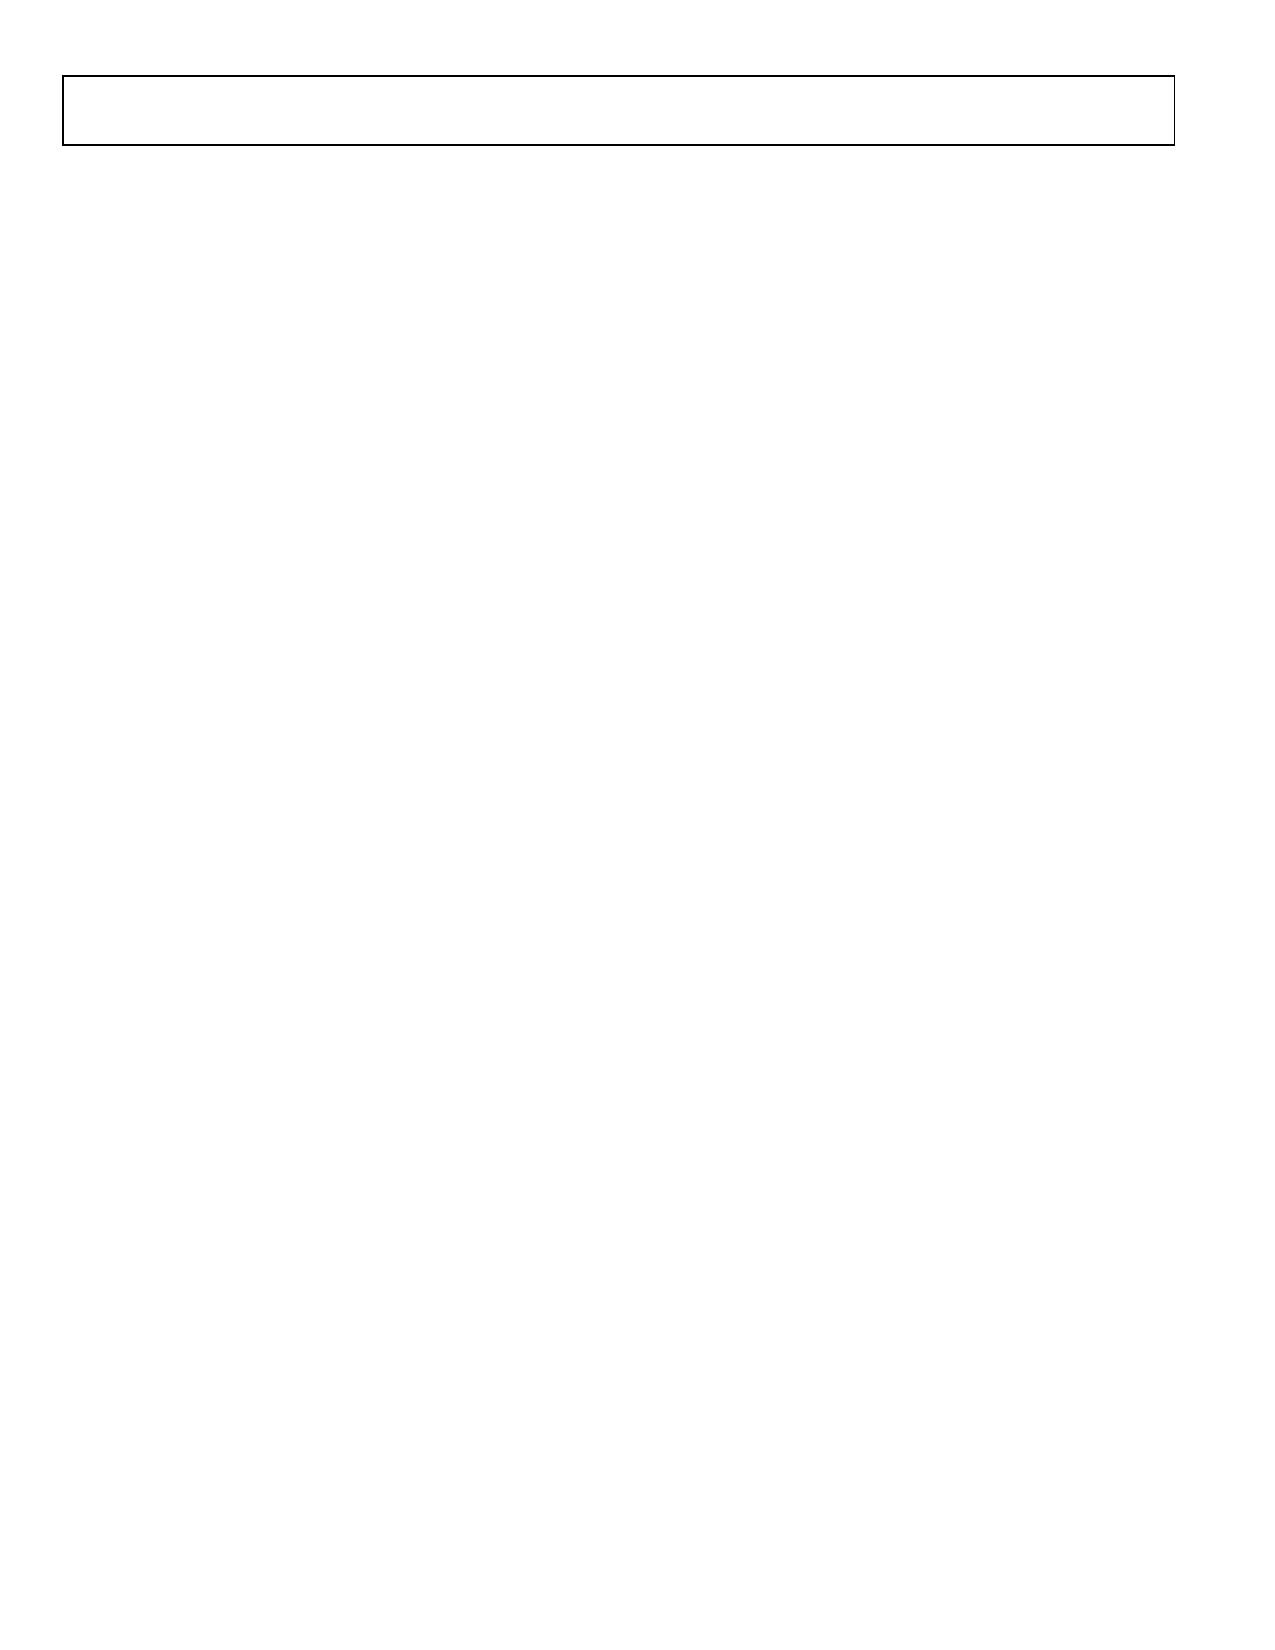 ADF41020 Даташит, Описание, Даташиты